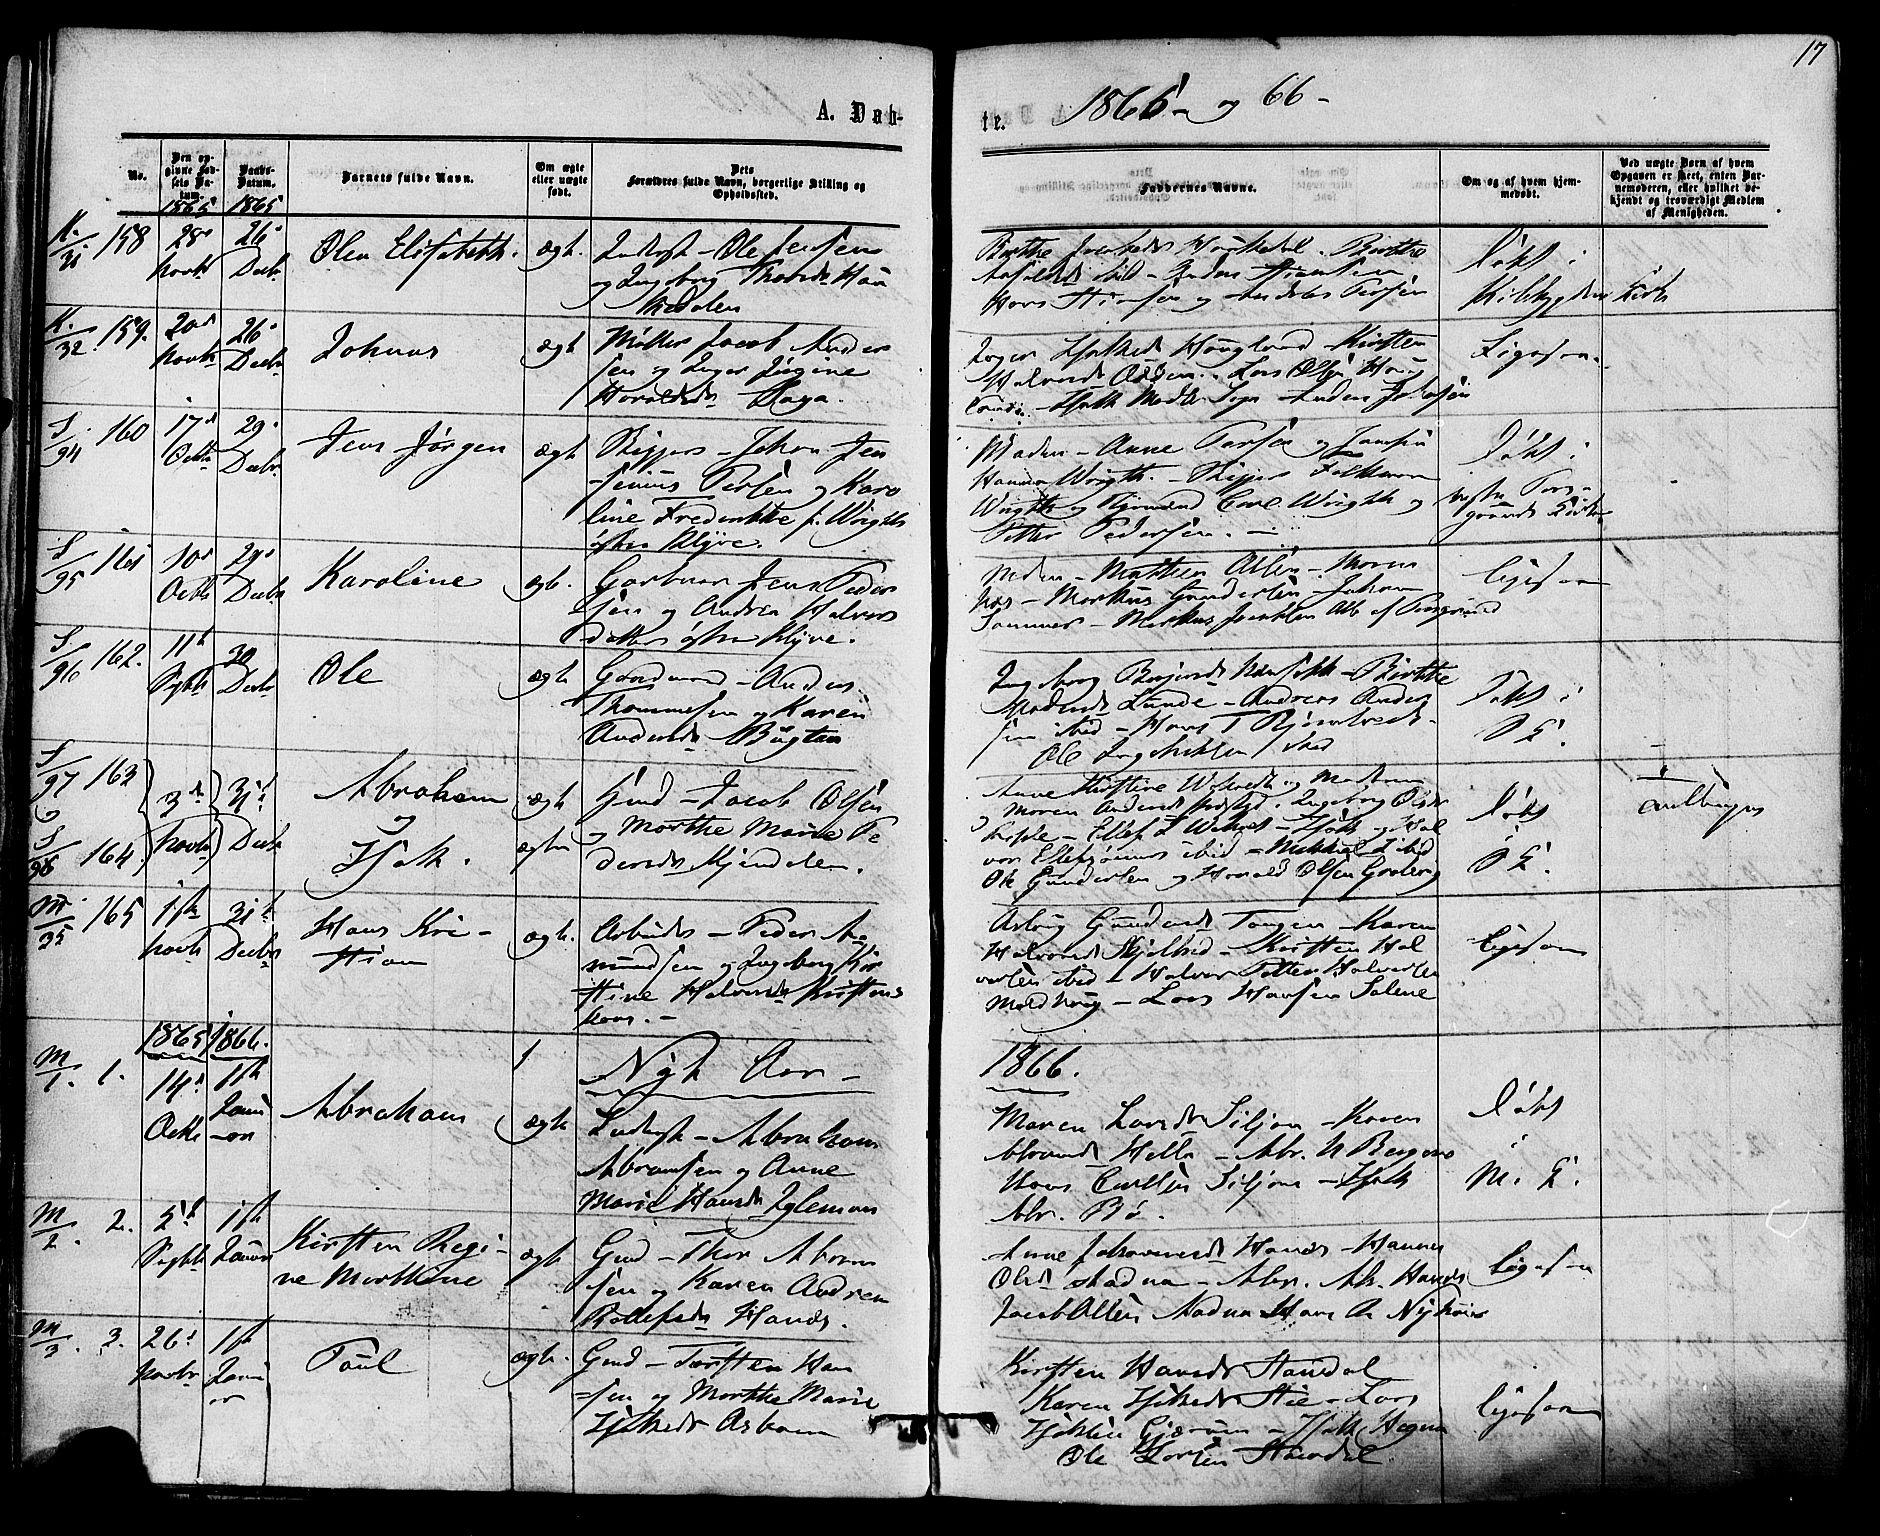 SAKO, Solum kirkebøker, F/Fa/L0008: Ministerialbok nr. I 8, 1865-1876, s. 17